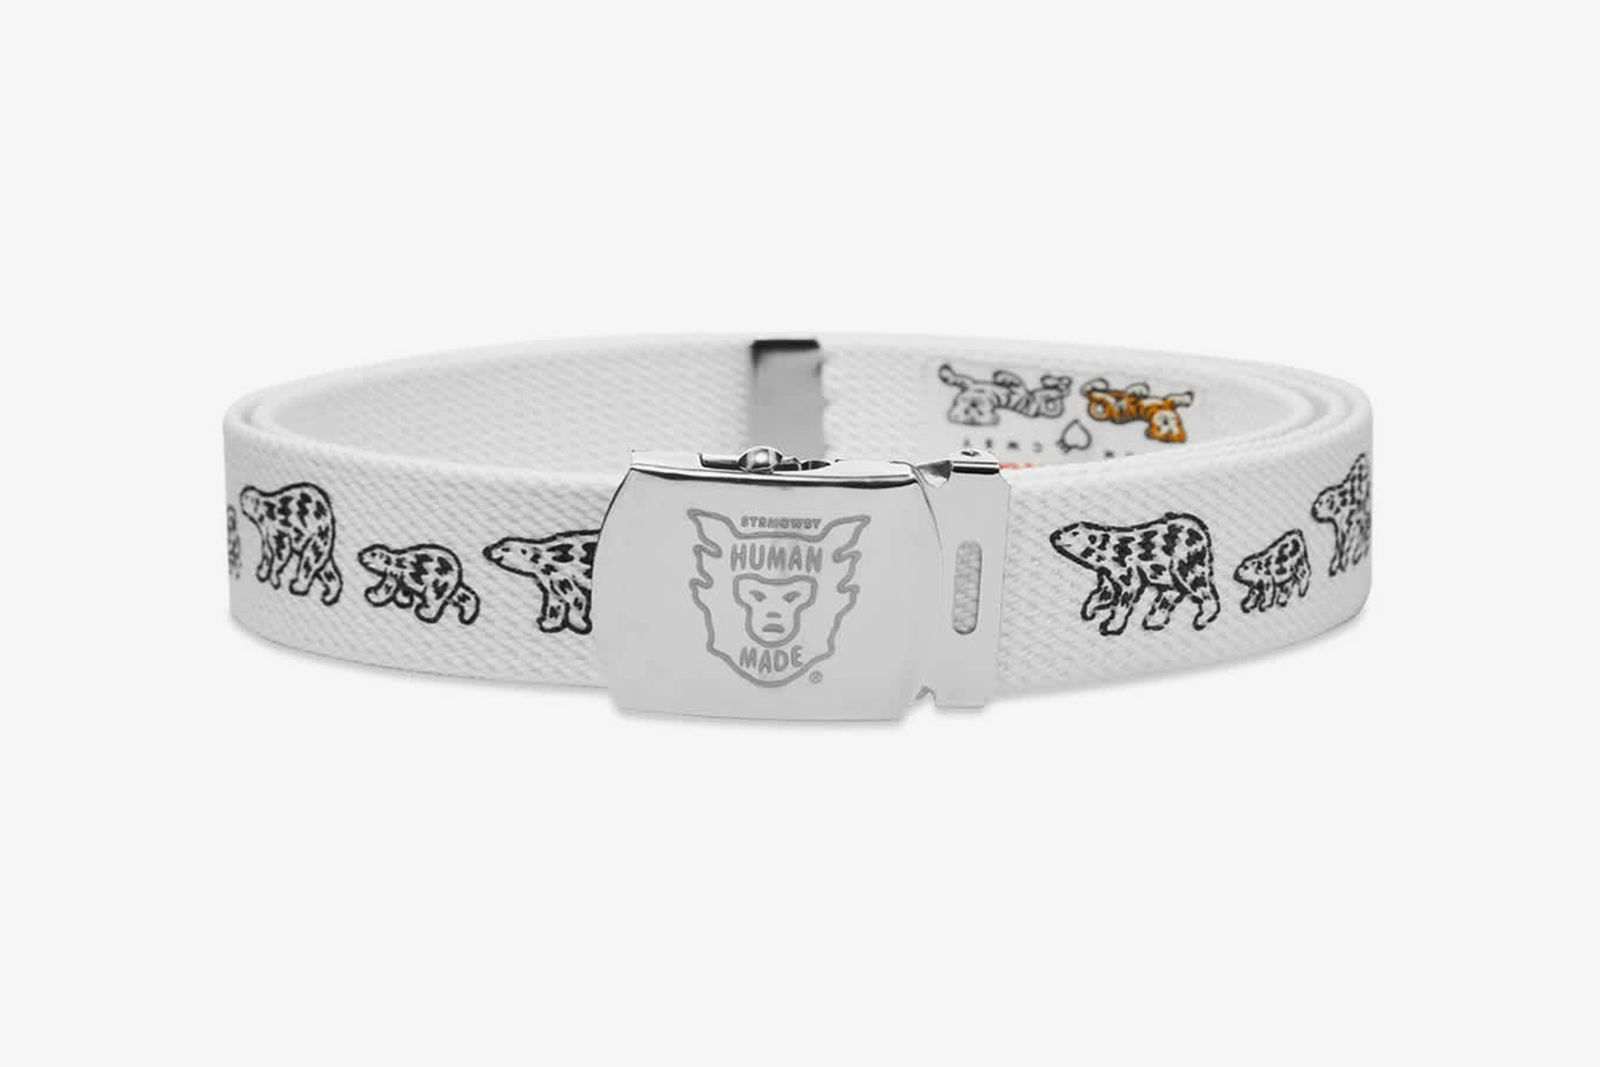 human-made-web-belt---white---_hm19gd041-wht_1